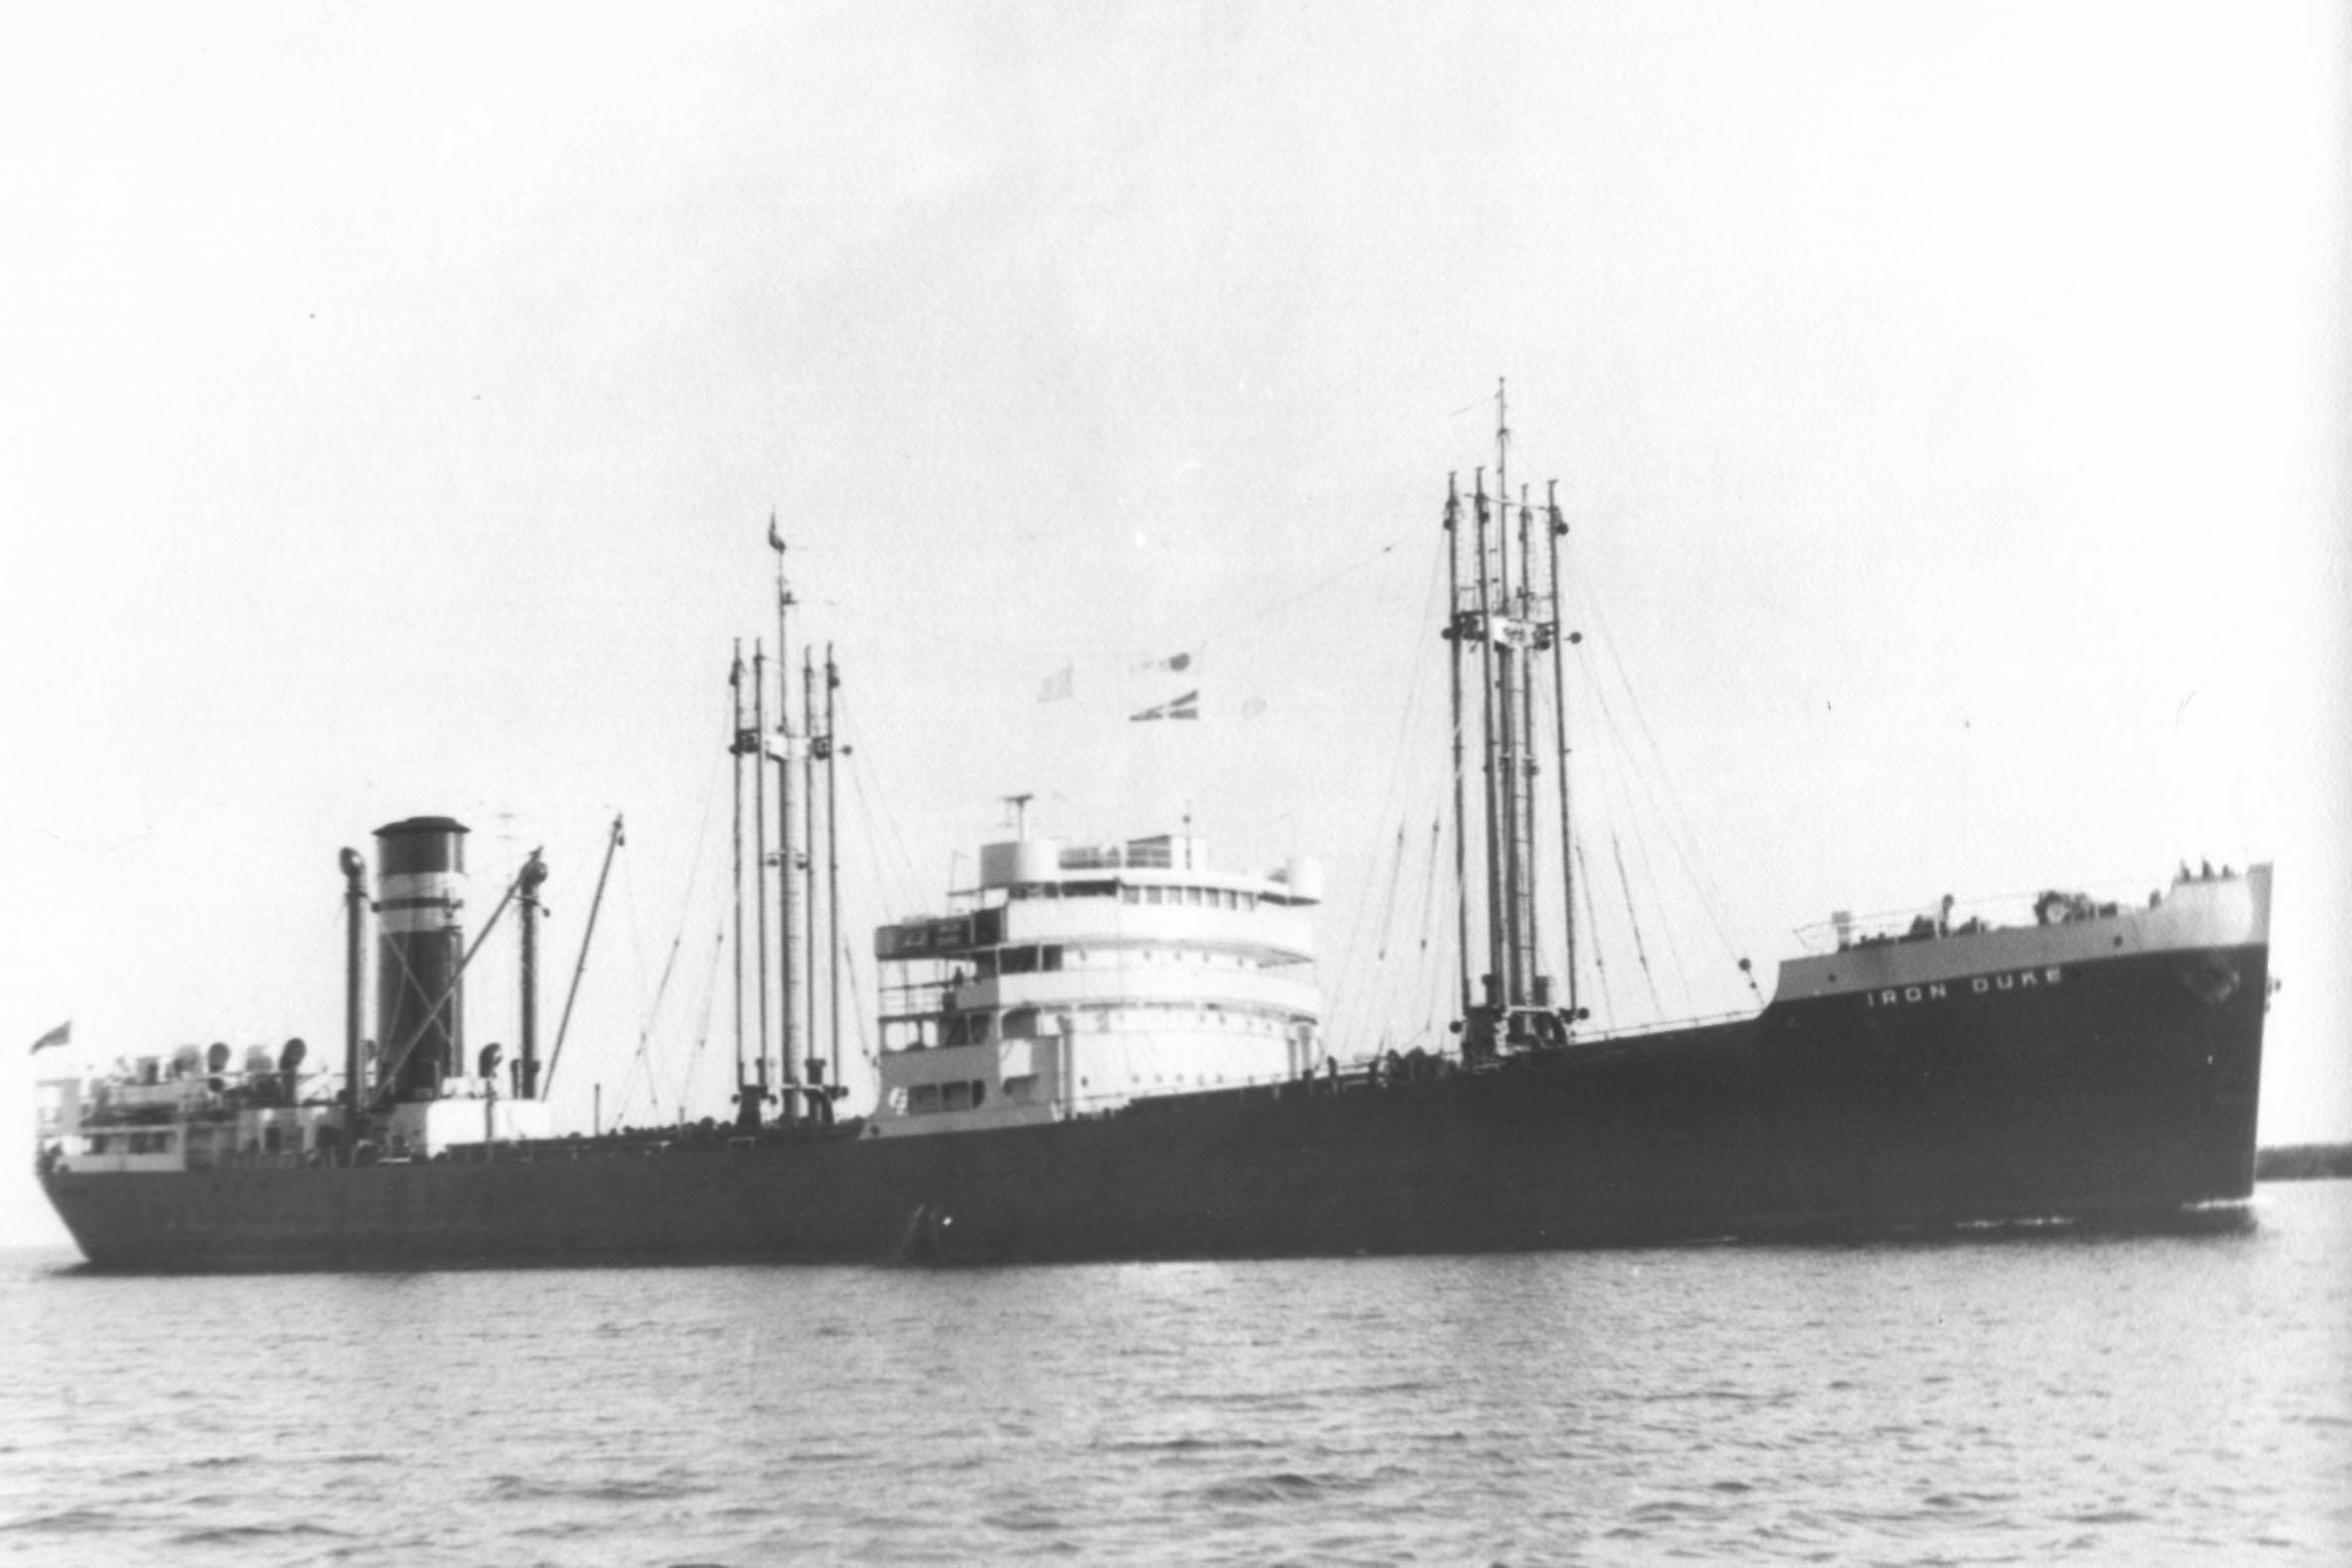 Chieftan Class freighter built in 1943.